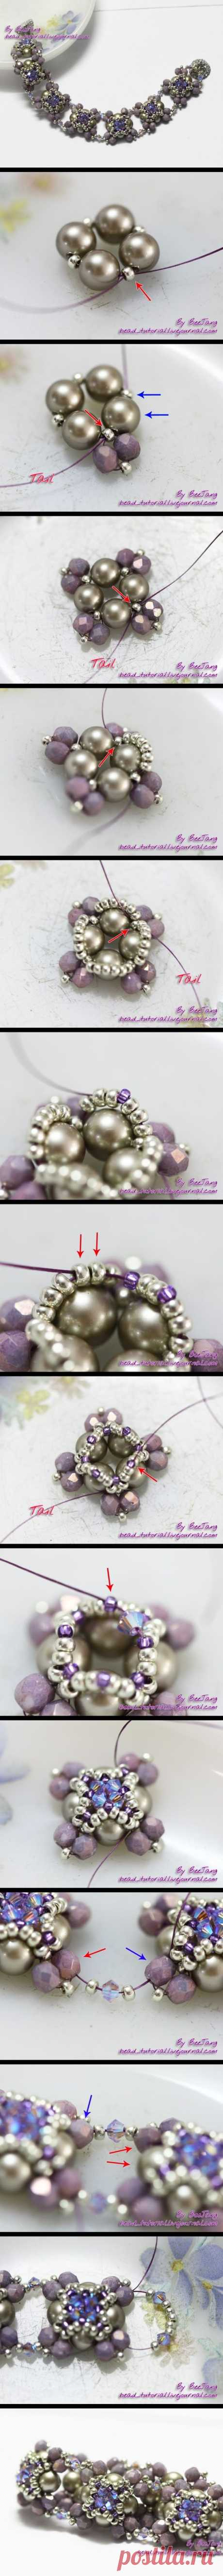 (24) PAP de bracelete   Bead patterns bracelets